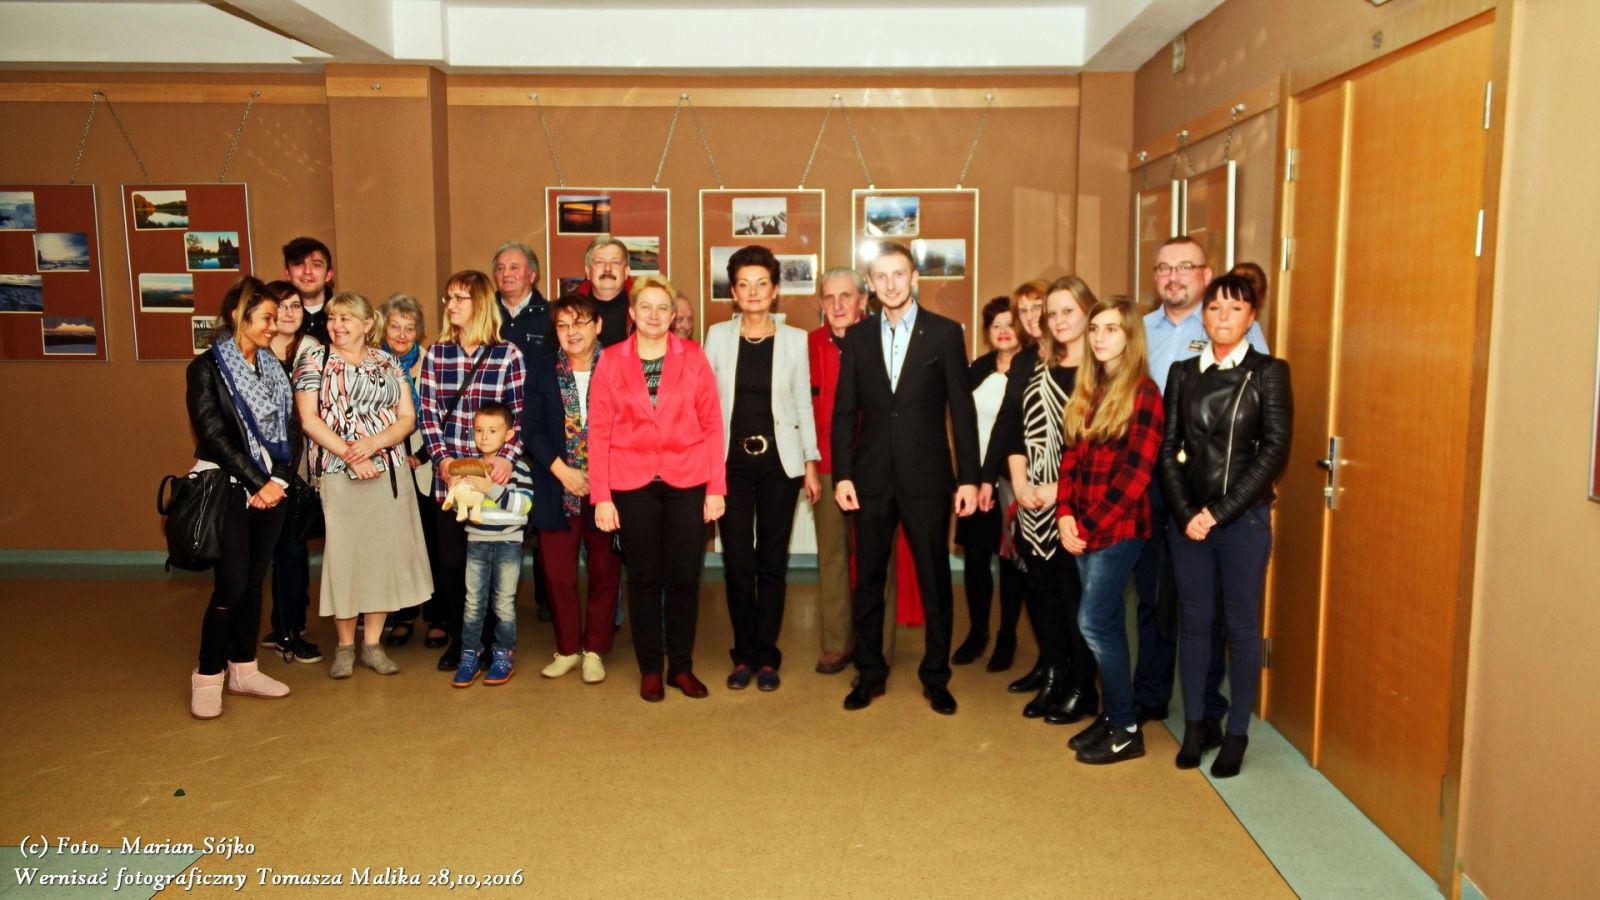 Wystawa fotografii Tomasza Malika w MBP-CK